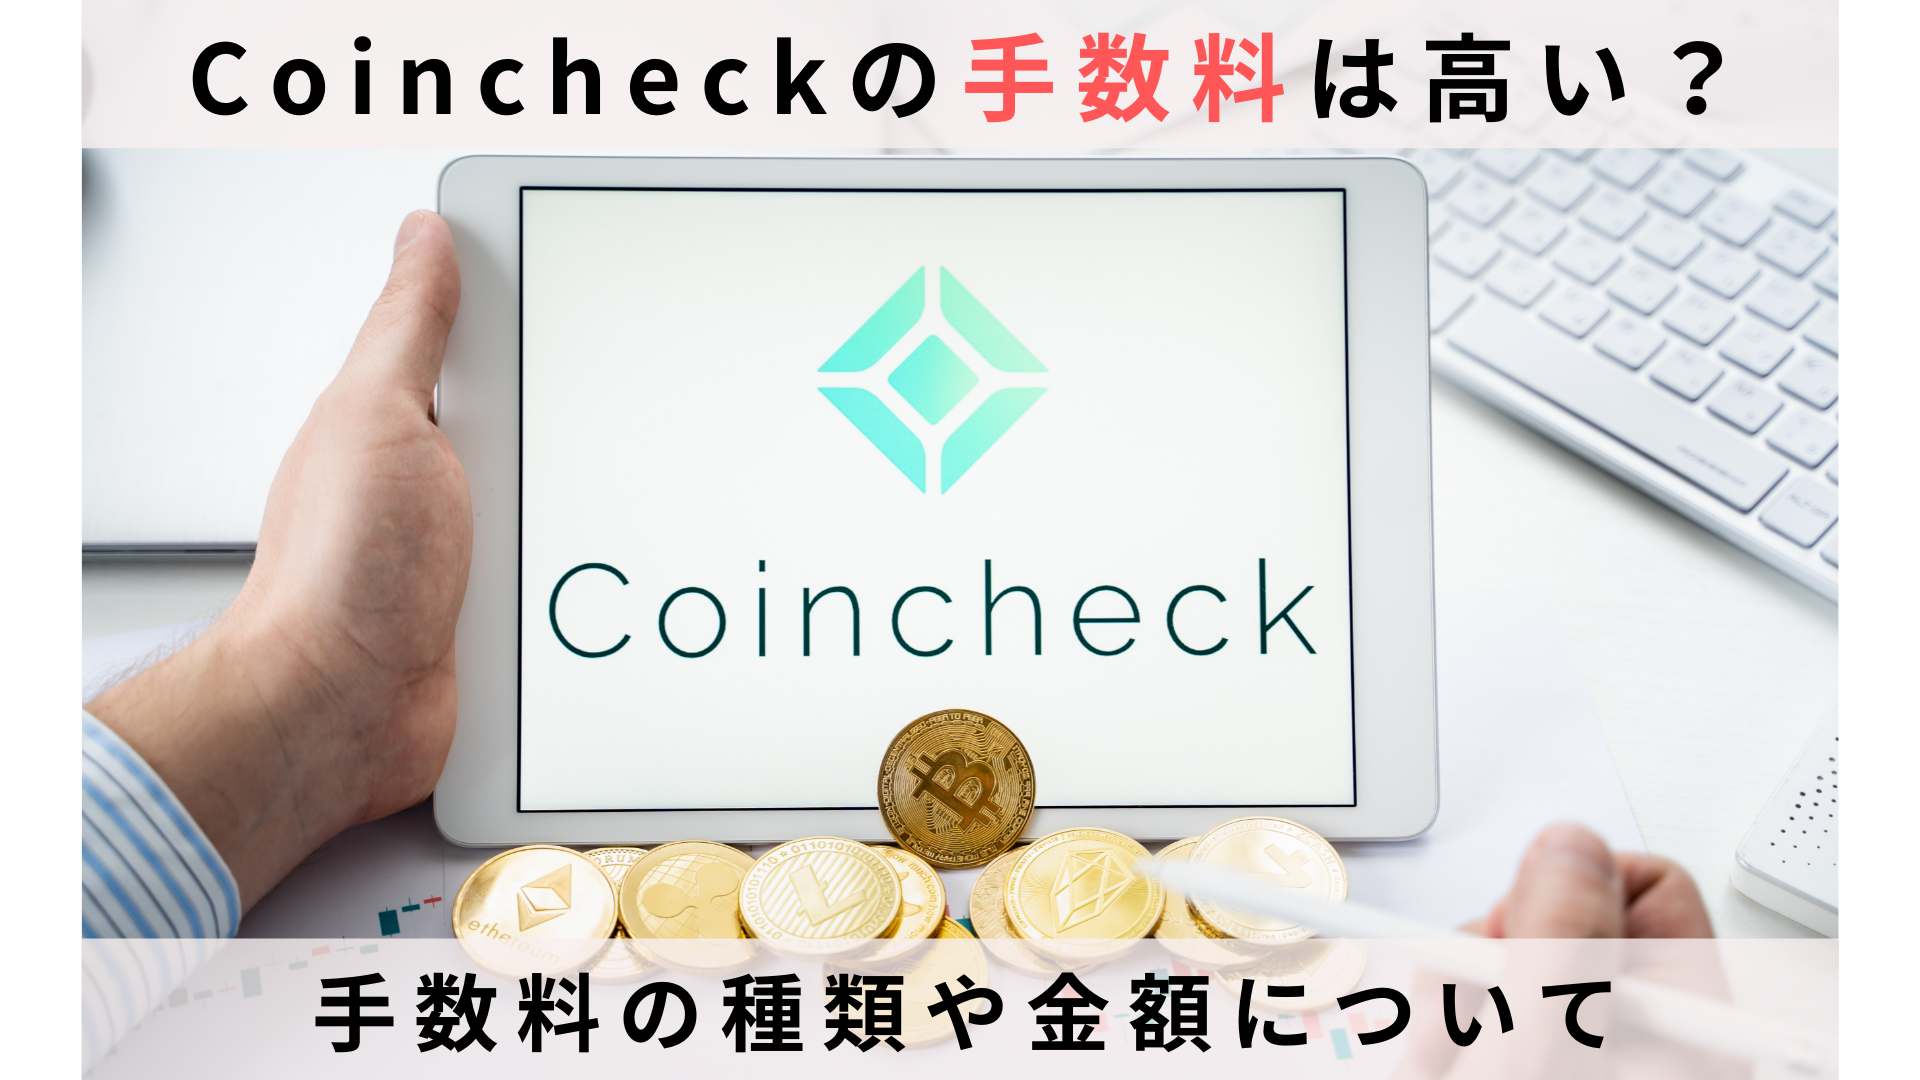 Coincheck(コインチェック)の手数料は高い?5つの種類を解説